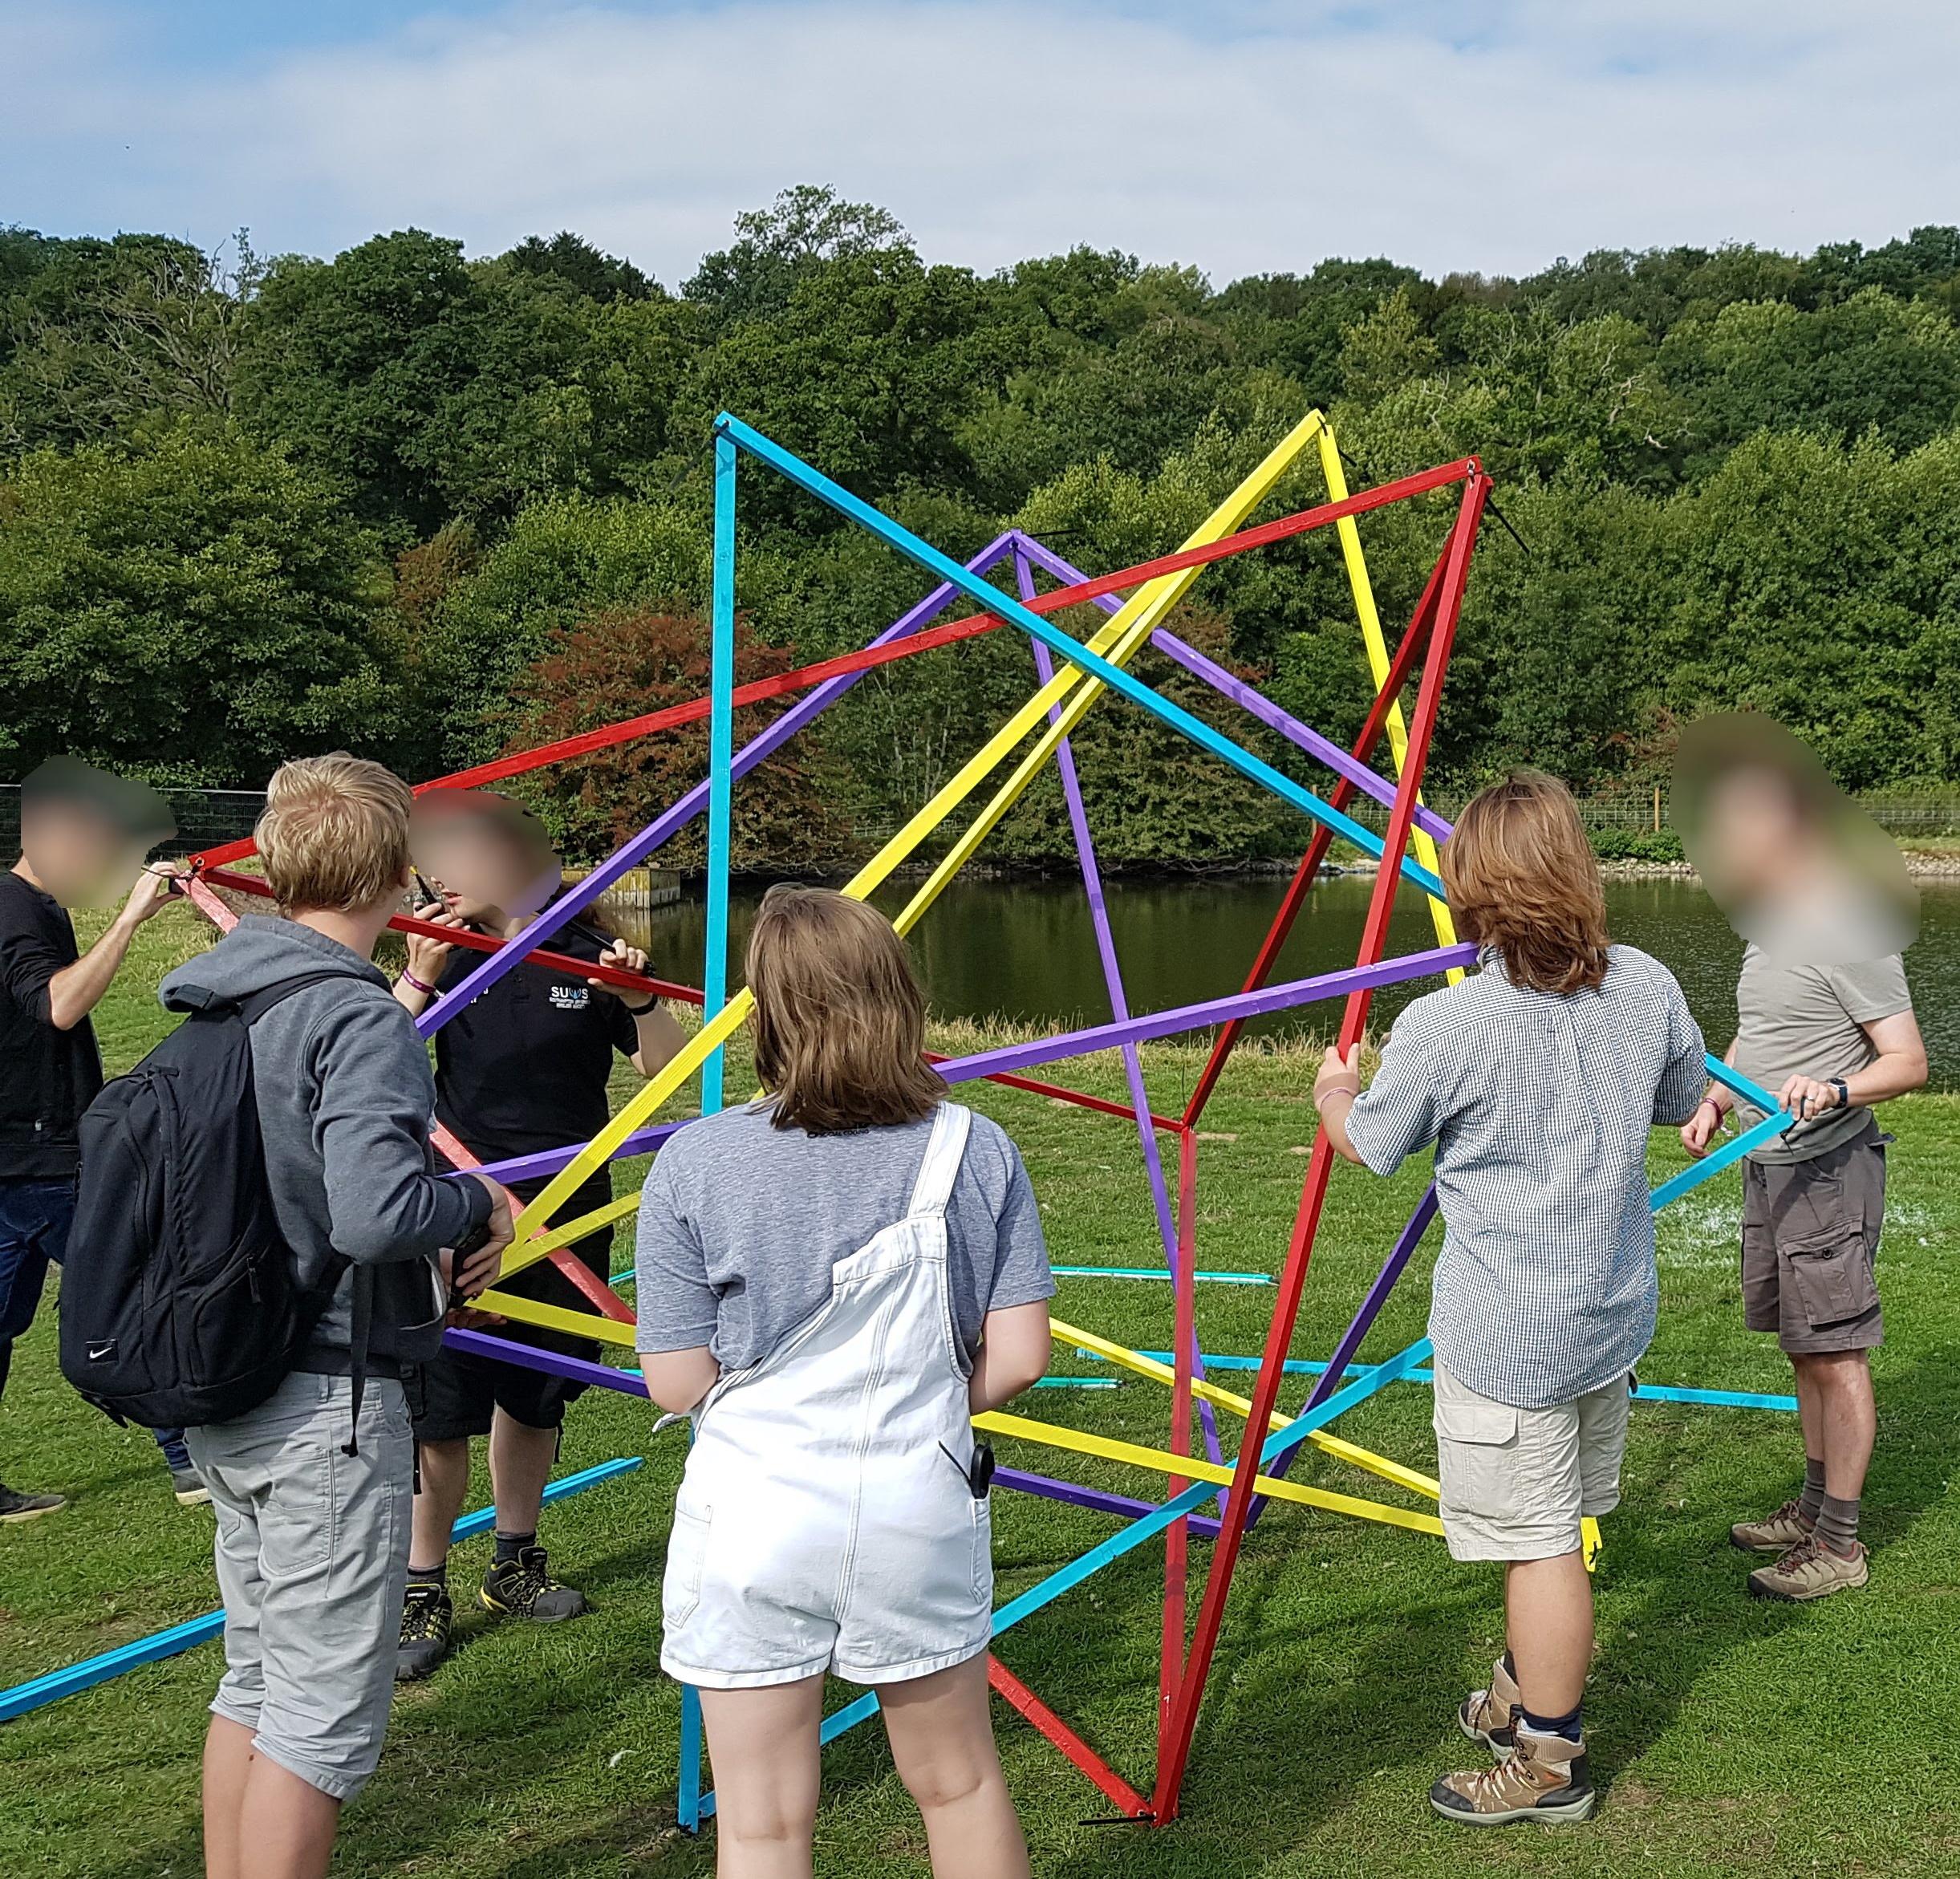 Five intersecting tetrahedra model in a field